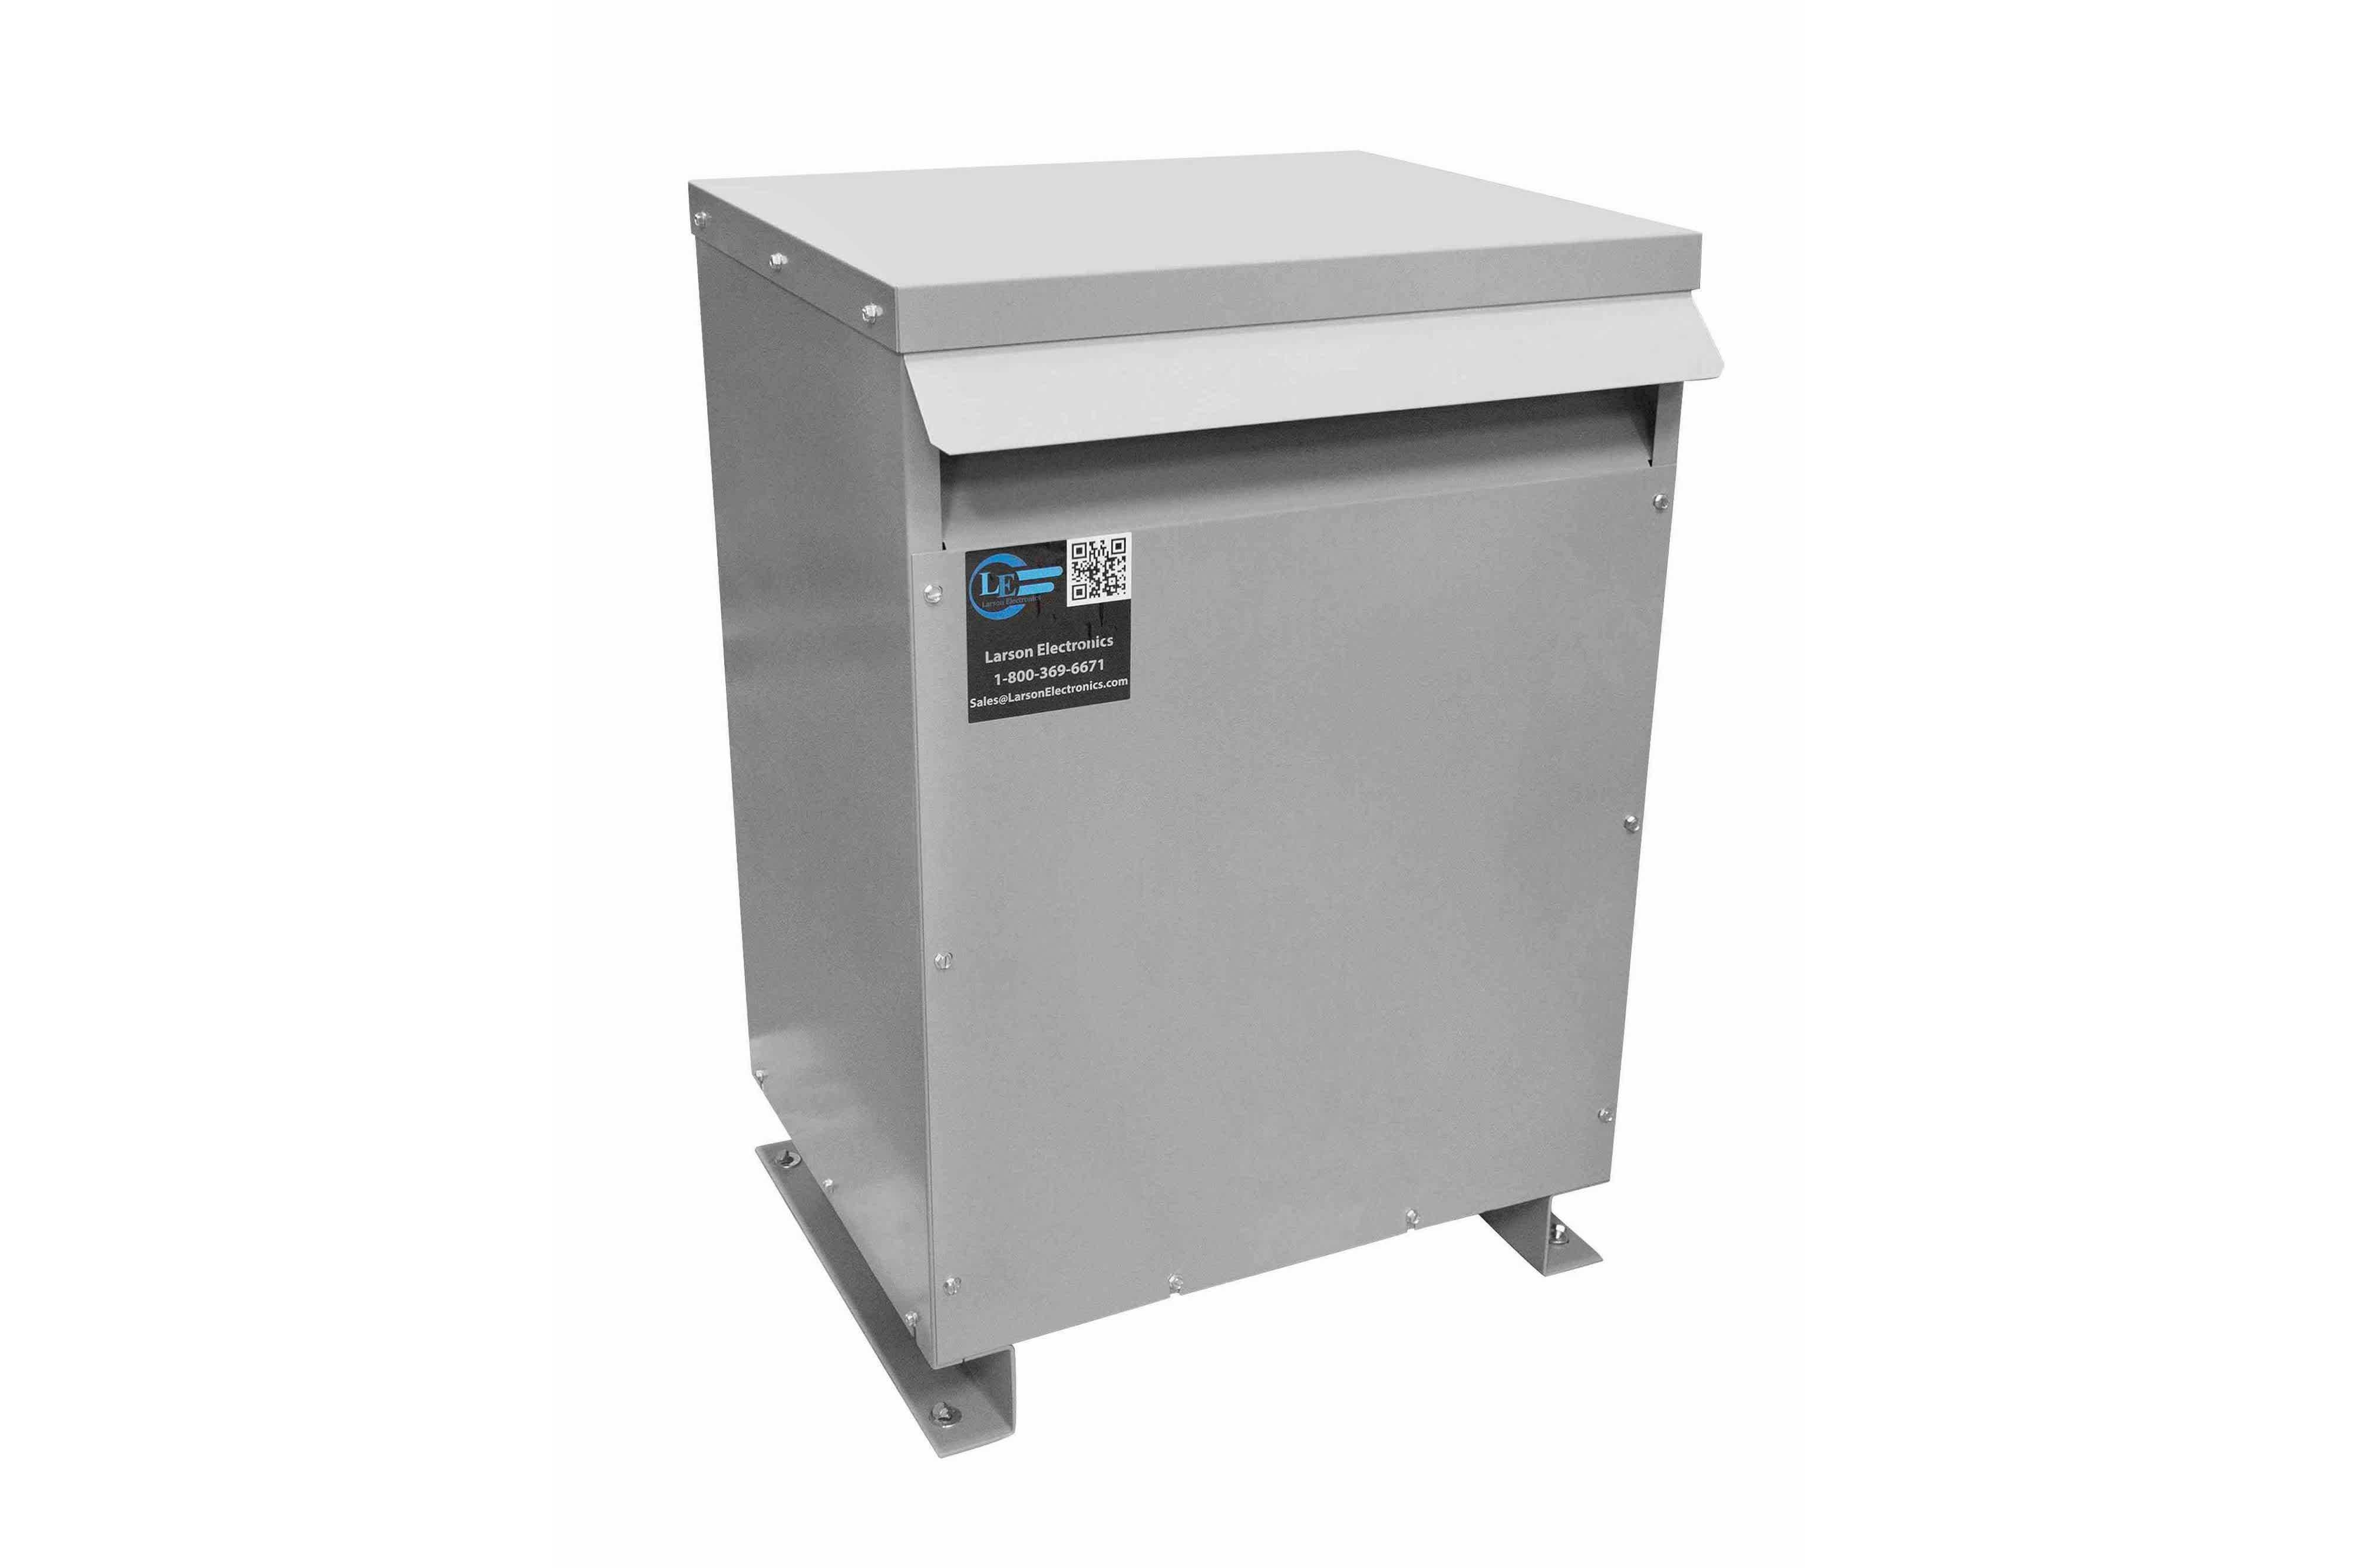 275 kVA 3PH Isolation Transformer, 240V Wye Primary, 415Y/240 Wye-N Secondary, N3R, Ventilated, 60 Hz